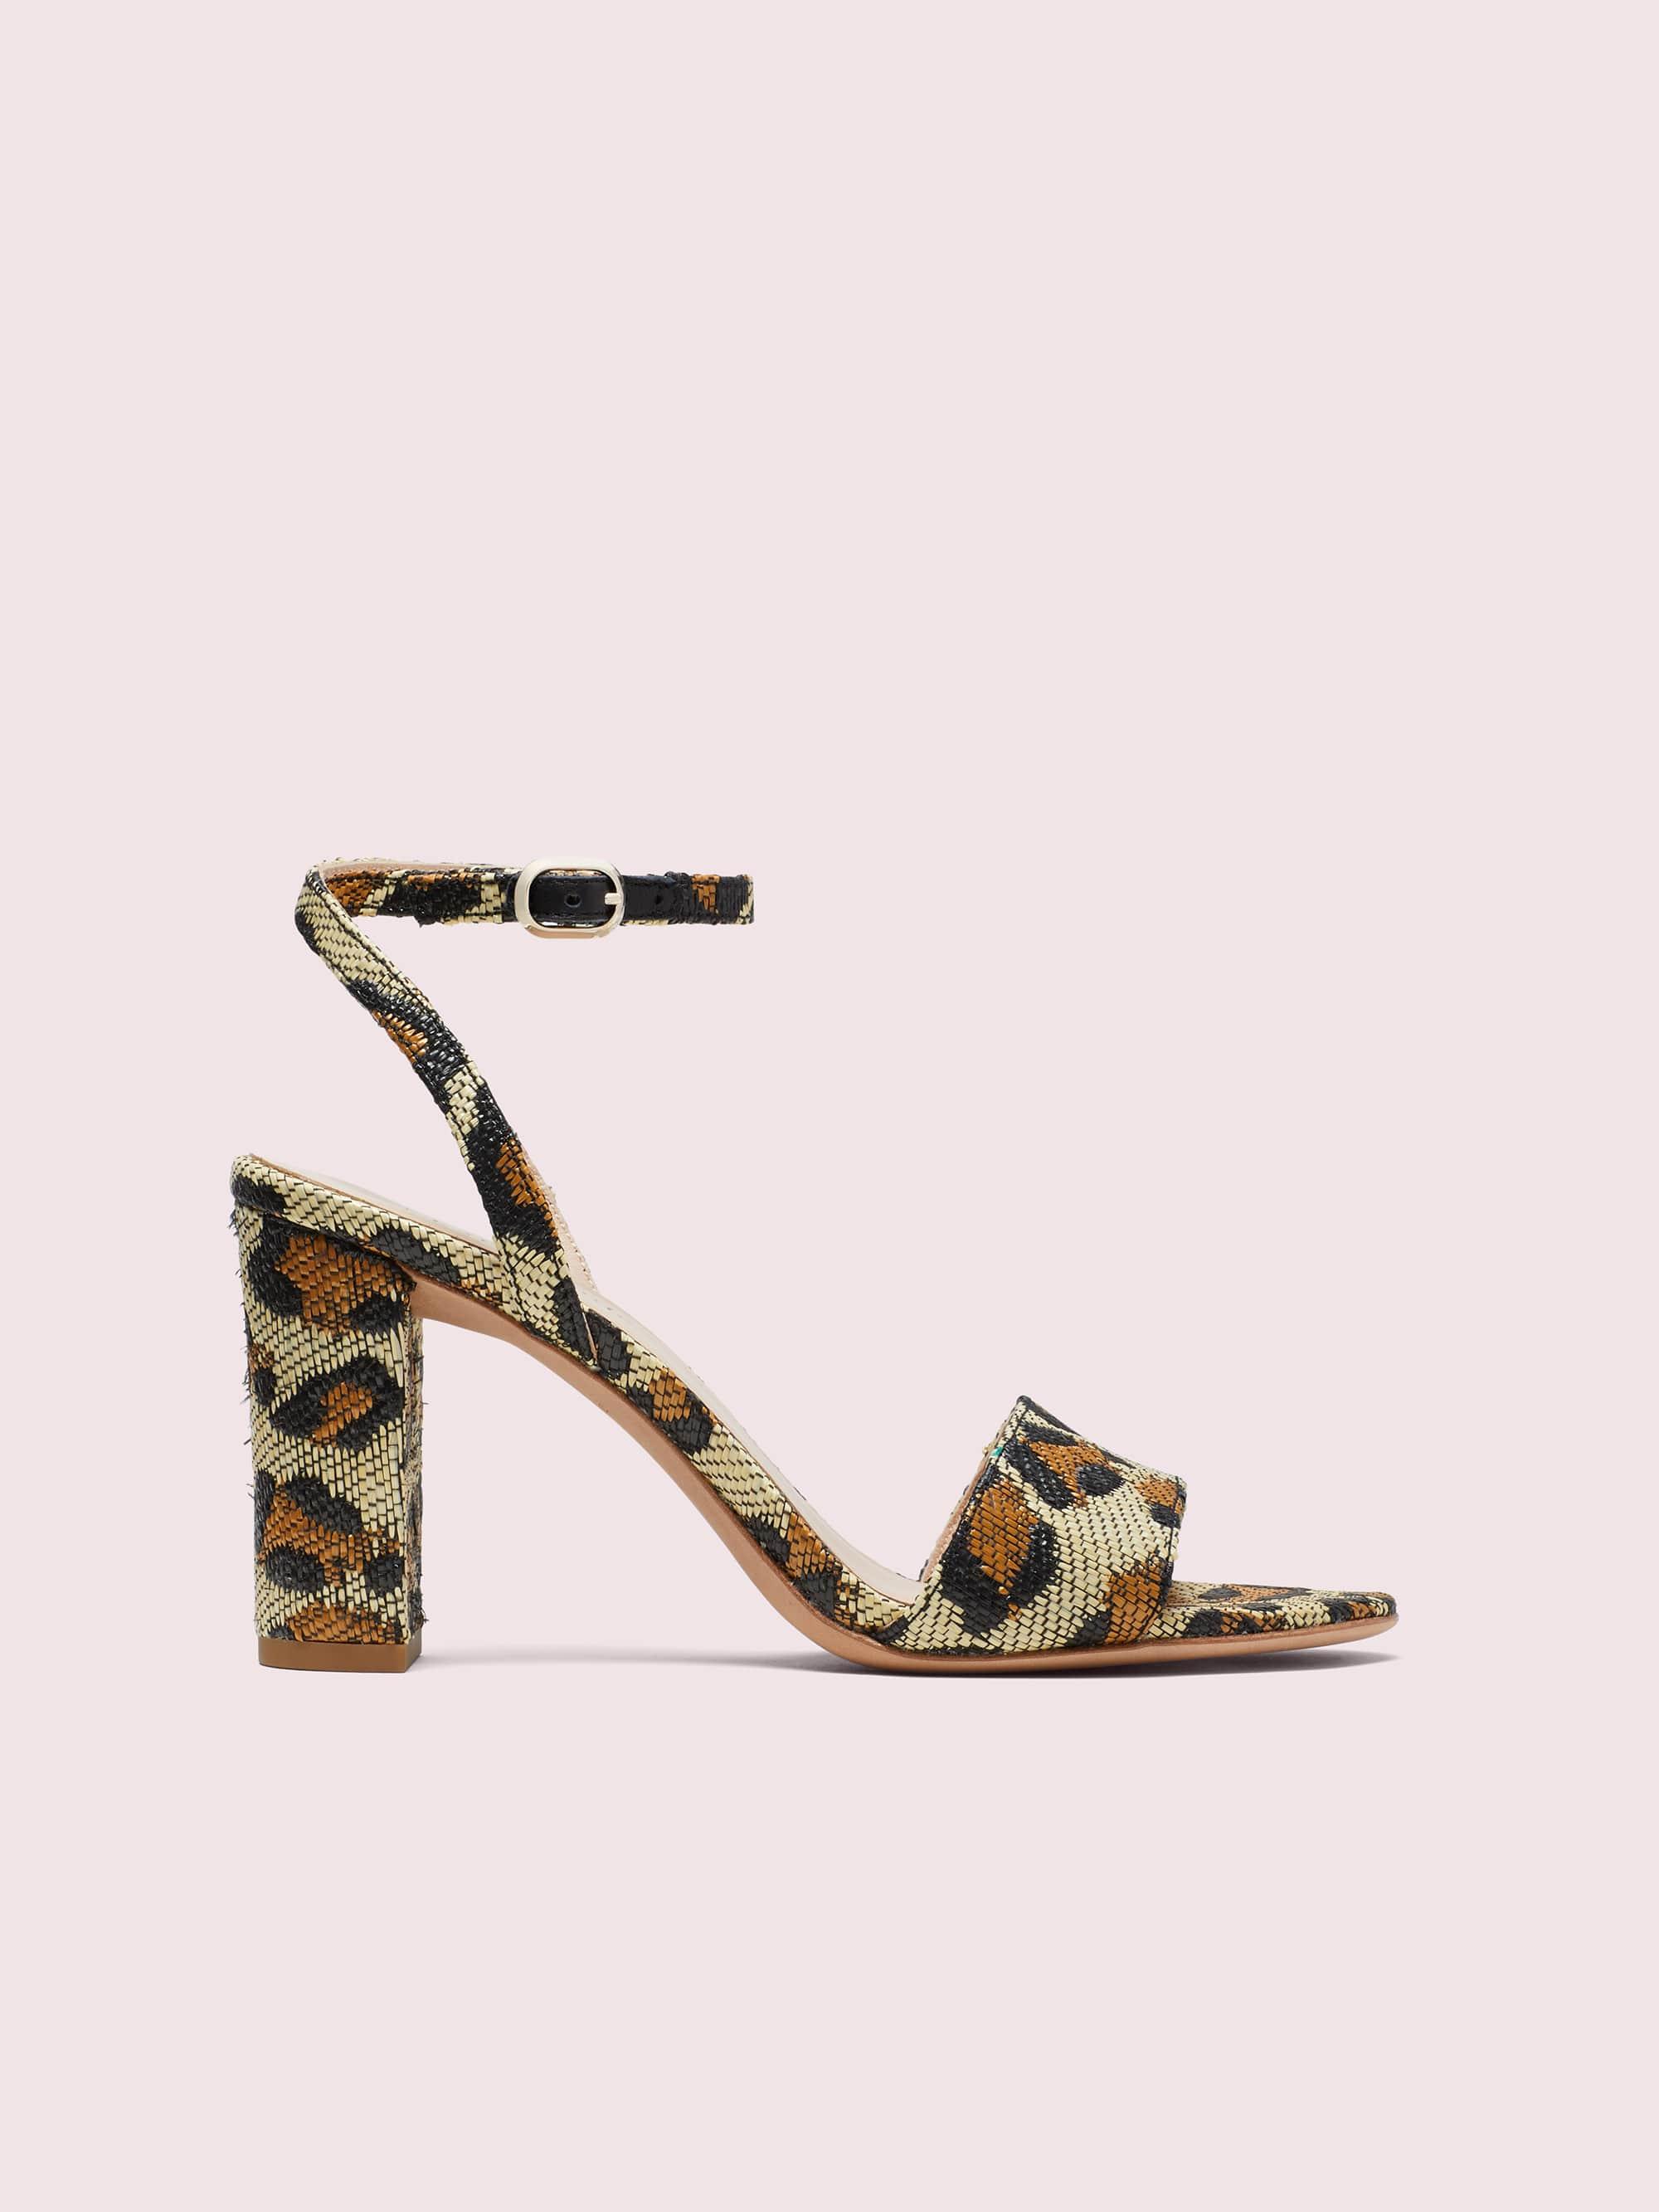 Kate spade odele leopard raffia sandals